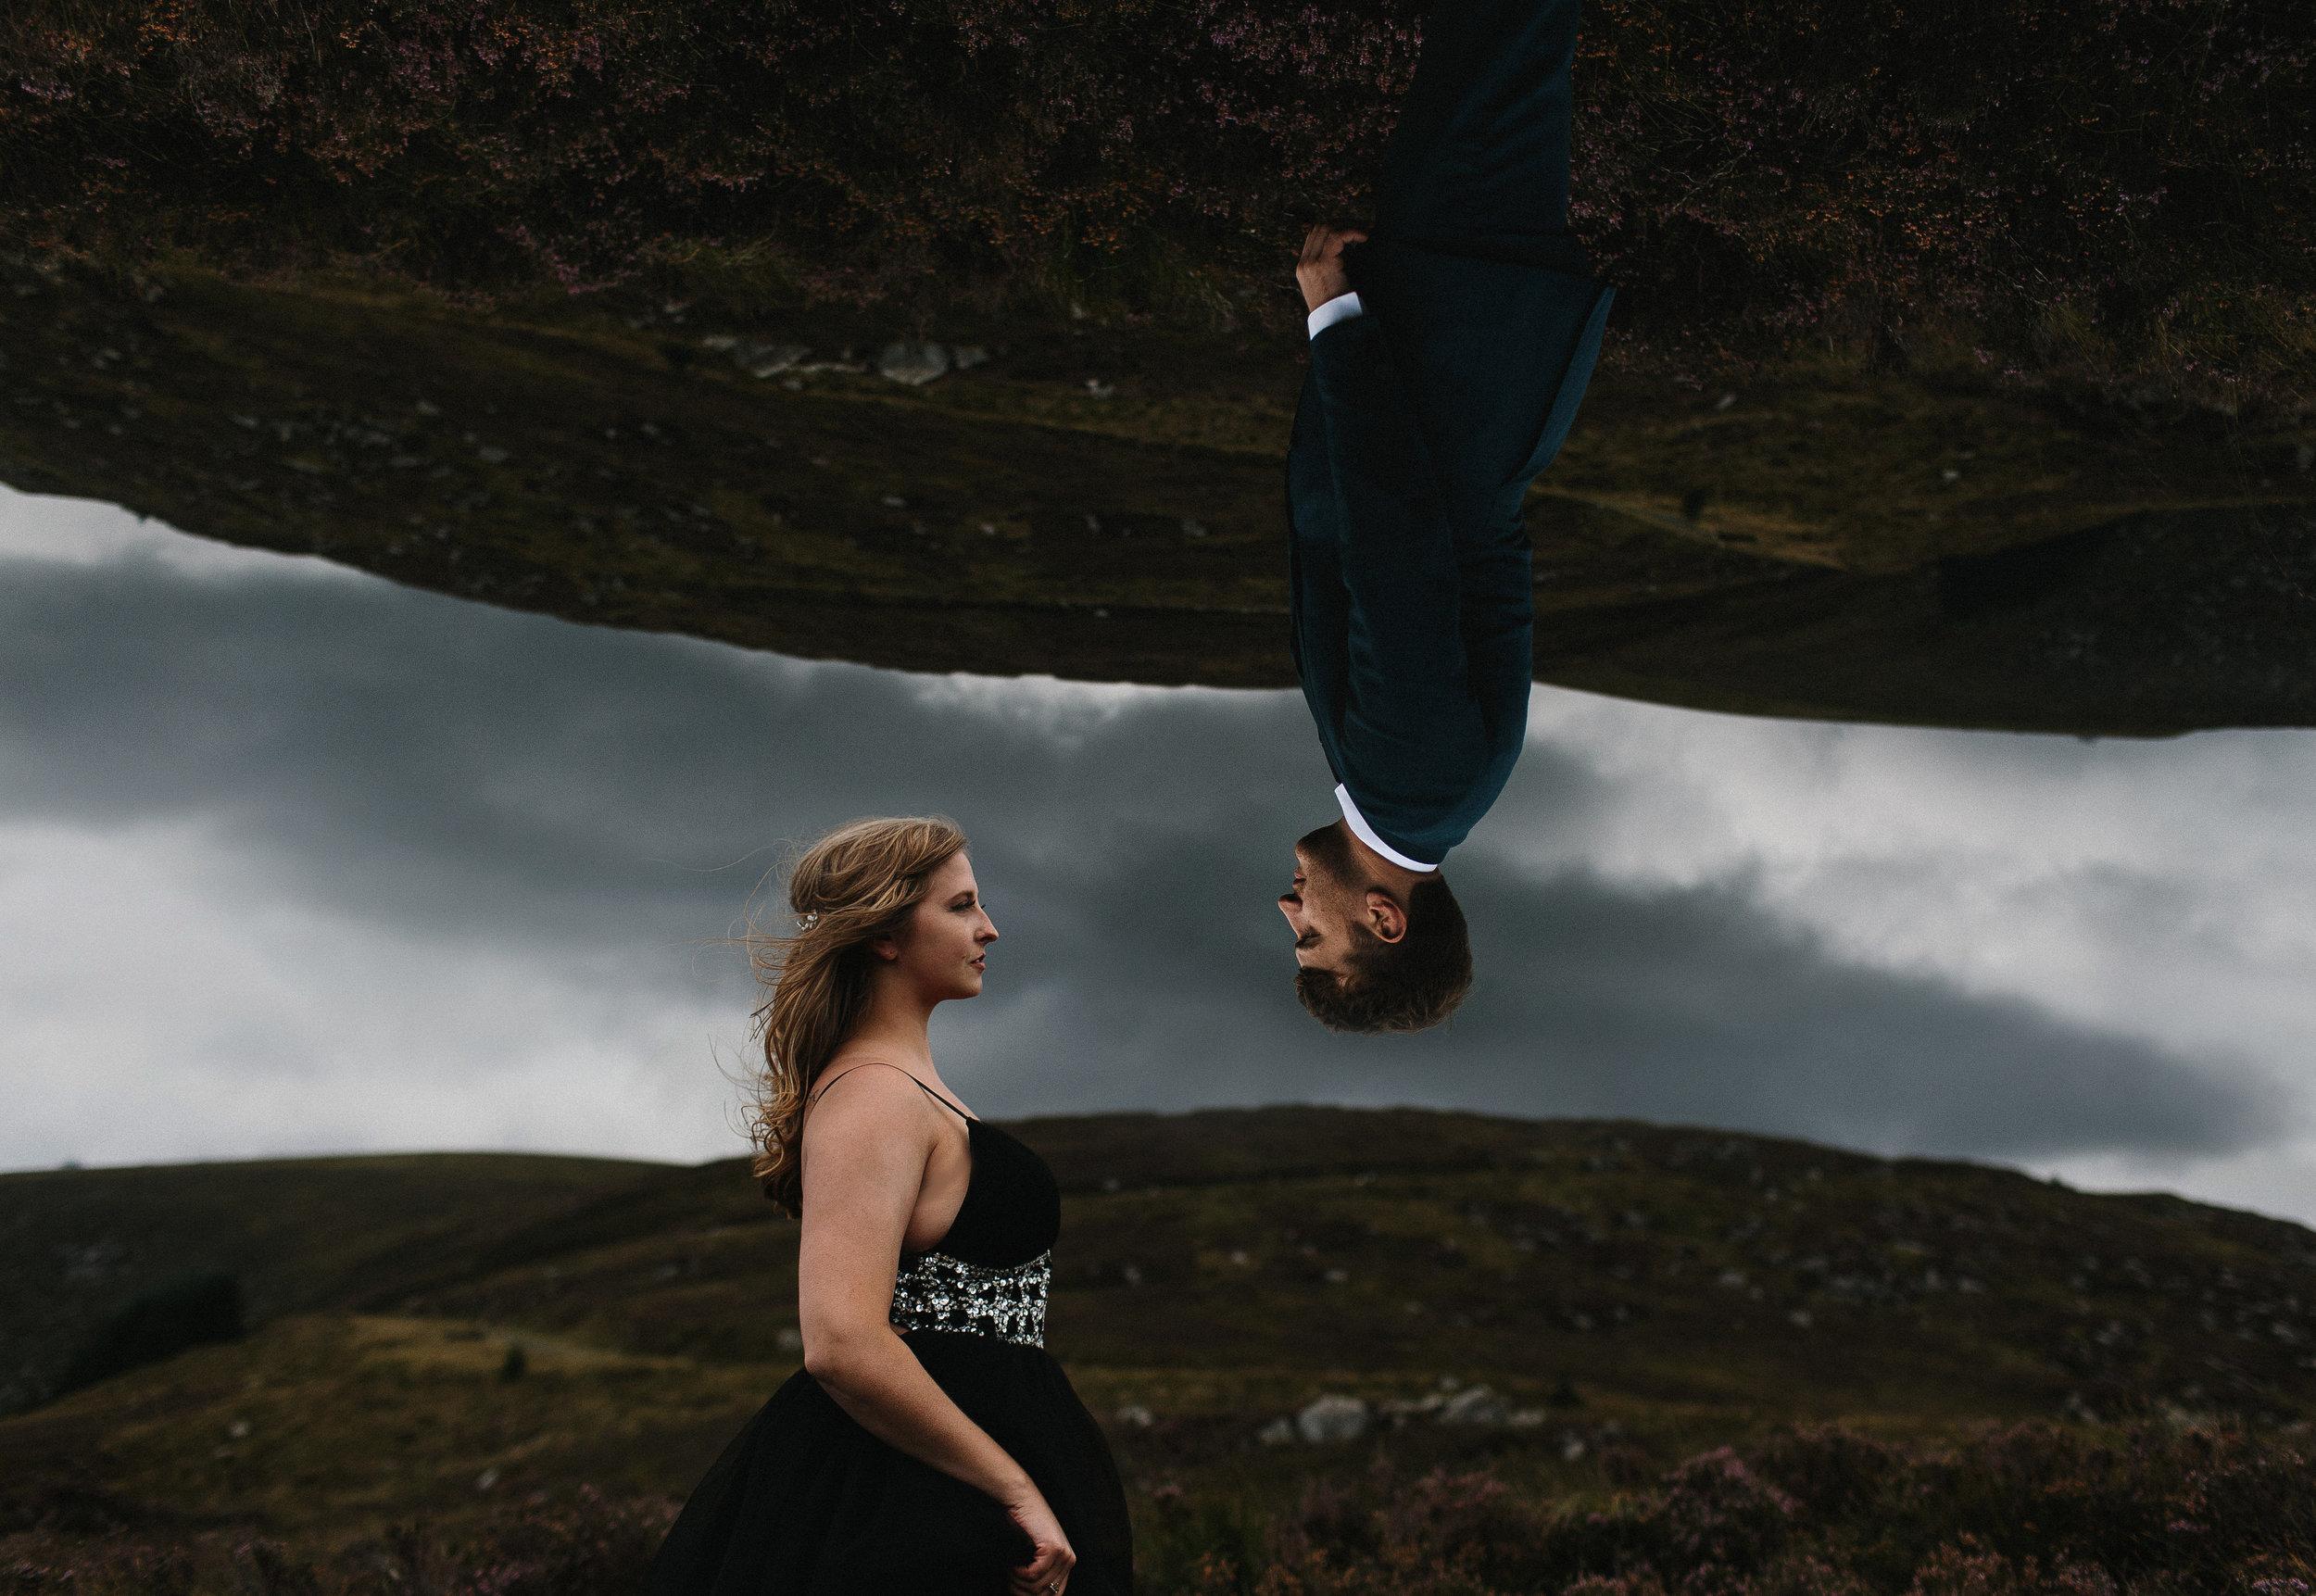 ireland_elopement_black_wedding_dress_wicklow_glendalough_athy_st_kevins_way_1591-2.jpg